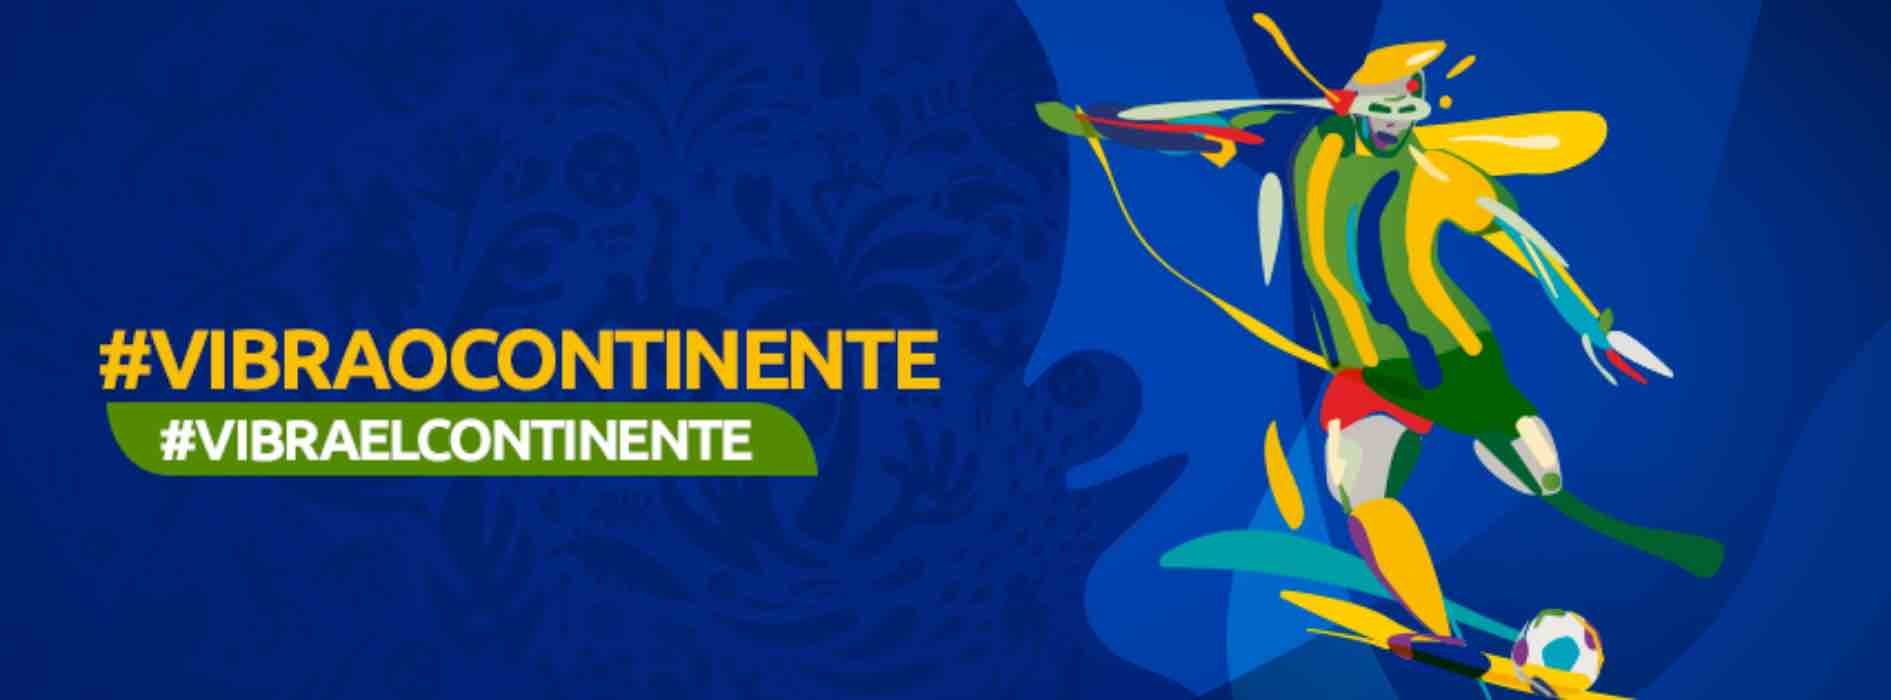 Copa América: Il Brasile batte l'Argentina 2-0 e vola in finale